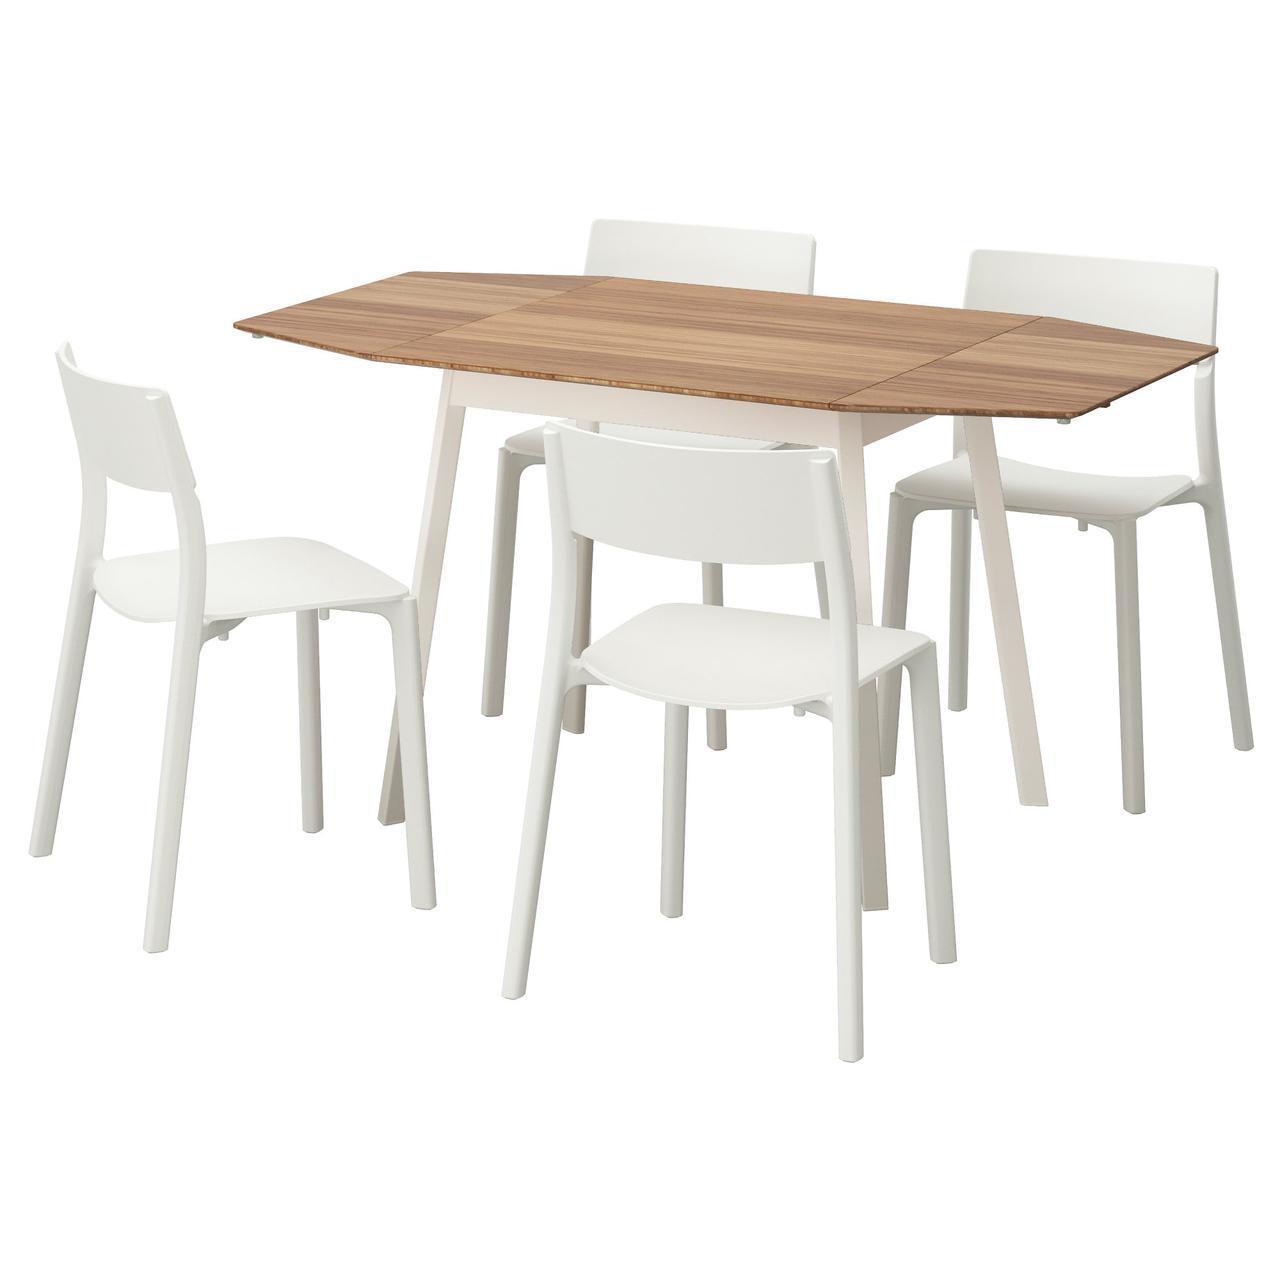 IKEA IKEA PS 2012 / JANINGE (691.614.82) Стол и 4 стула, бамбук